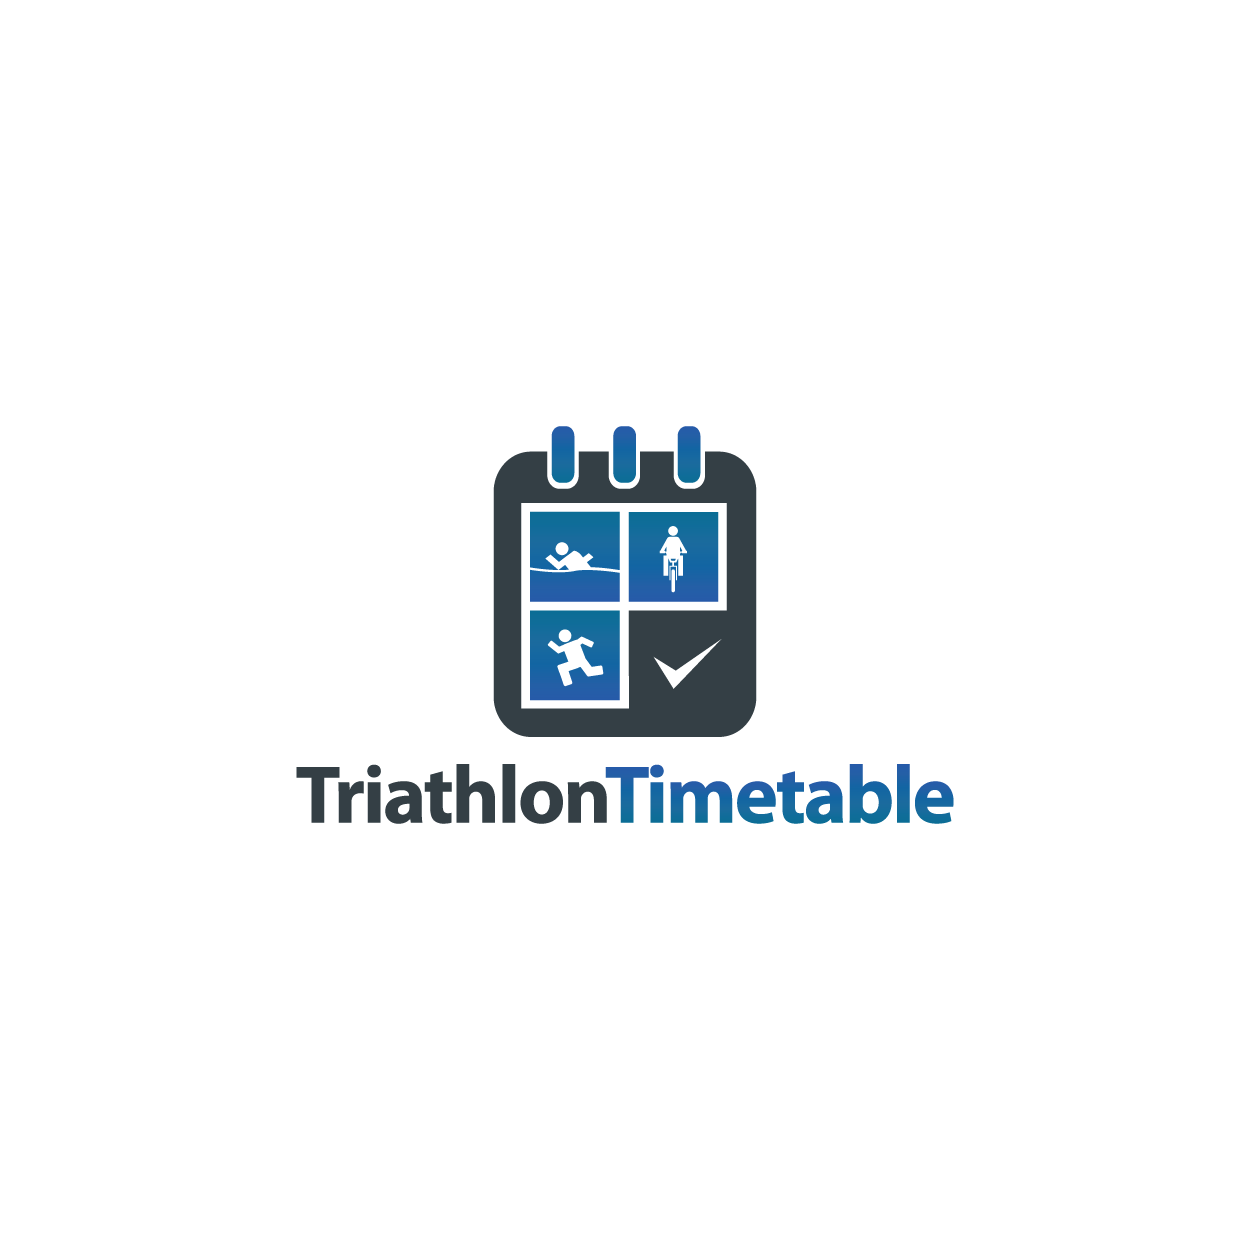 Triathlon Timetable needs a new logo